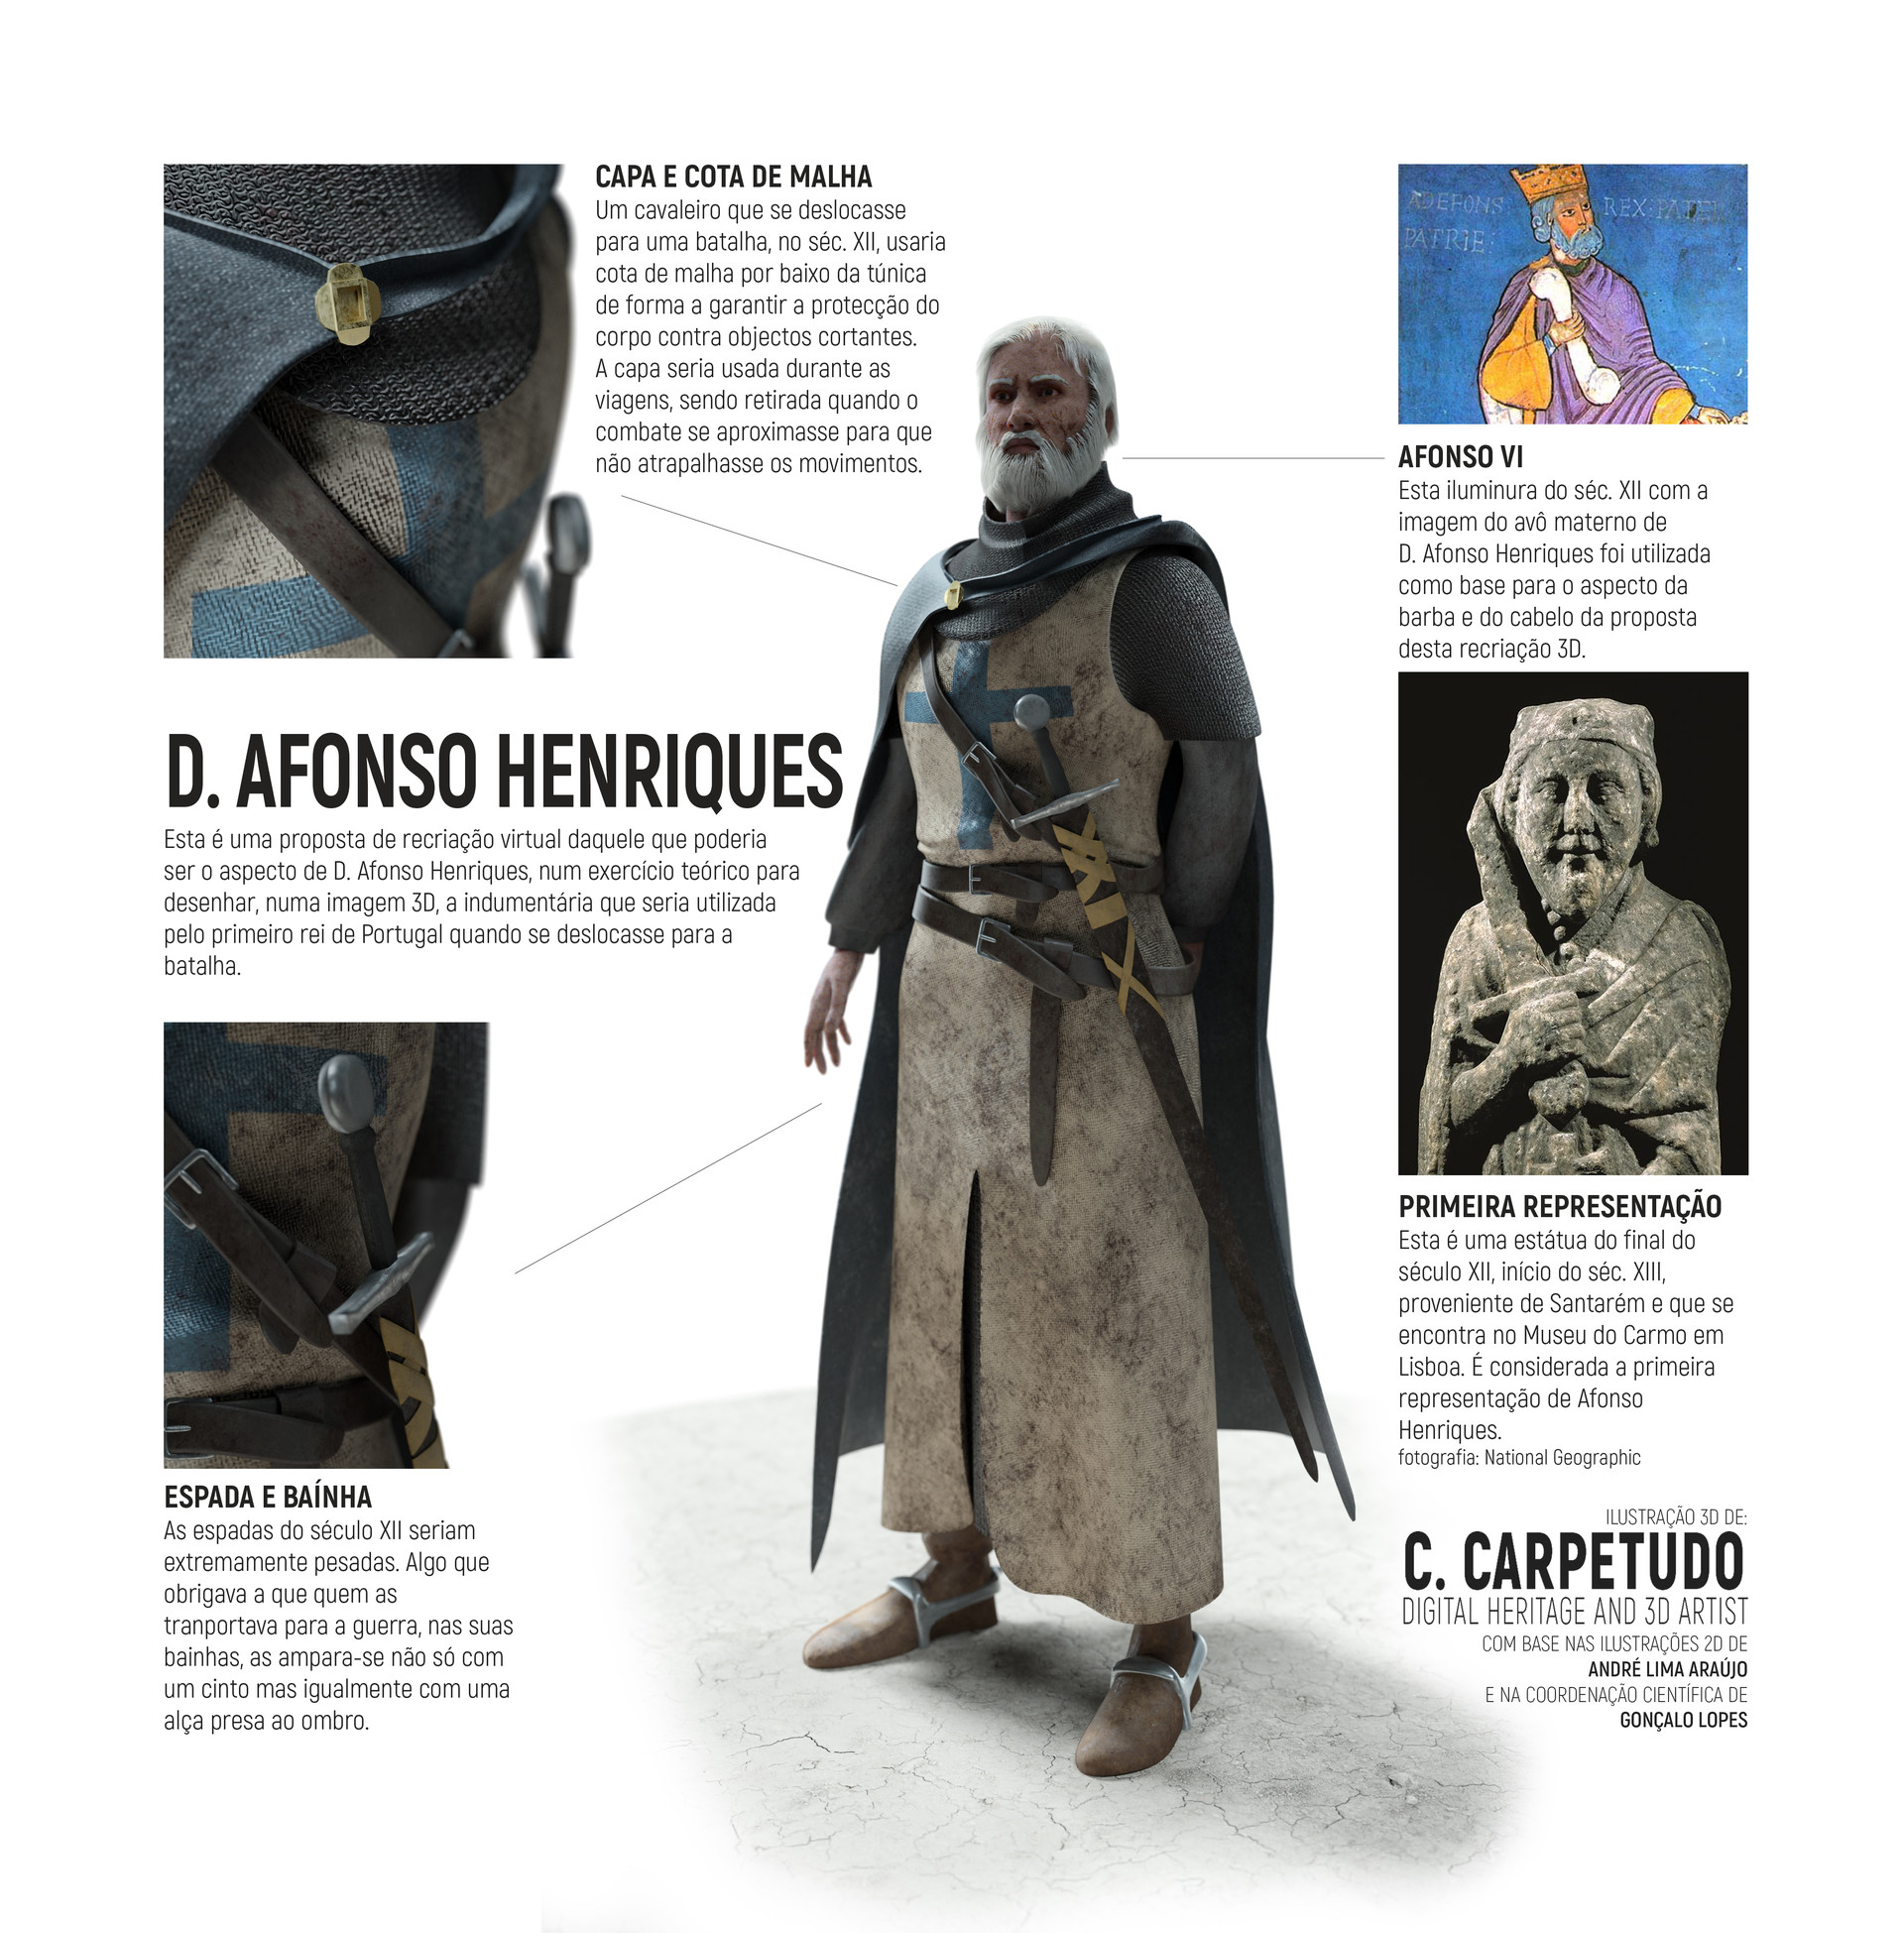 Carlos carpetudo afonsohenriques web infografia